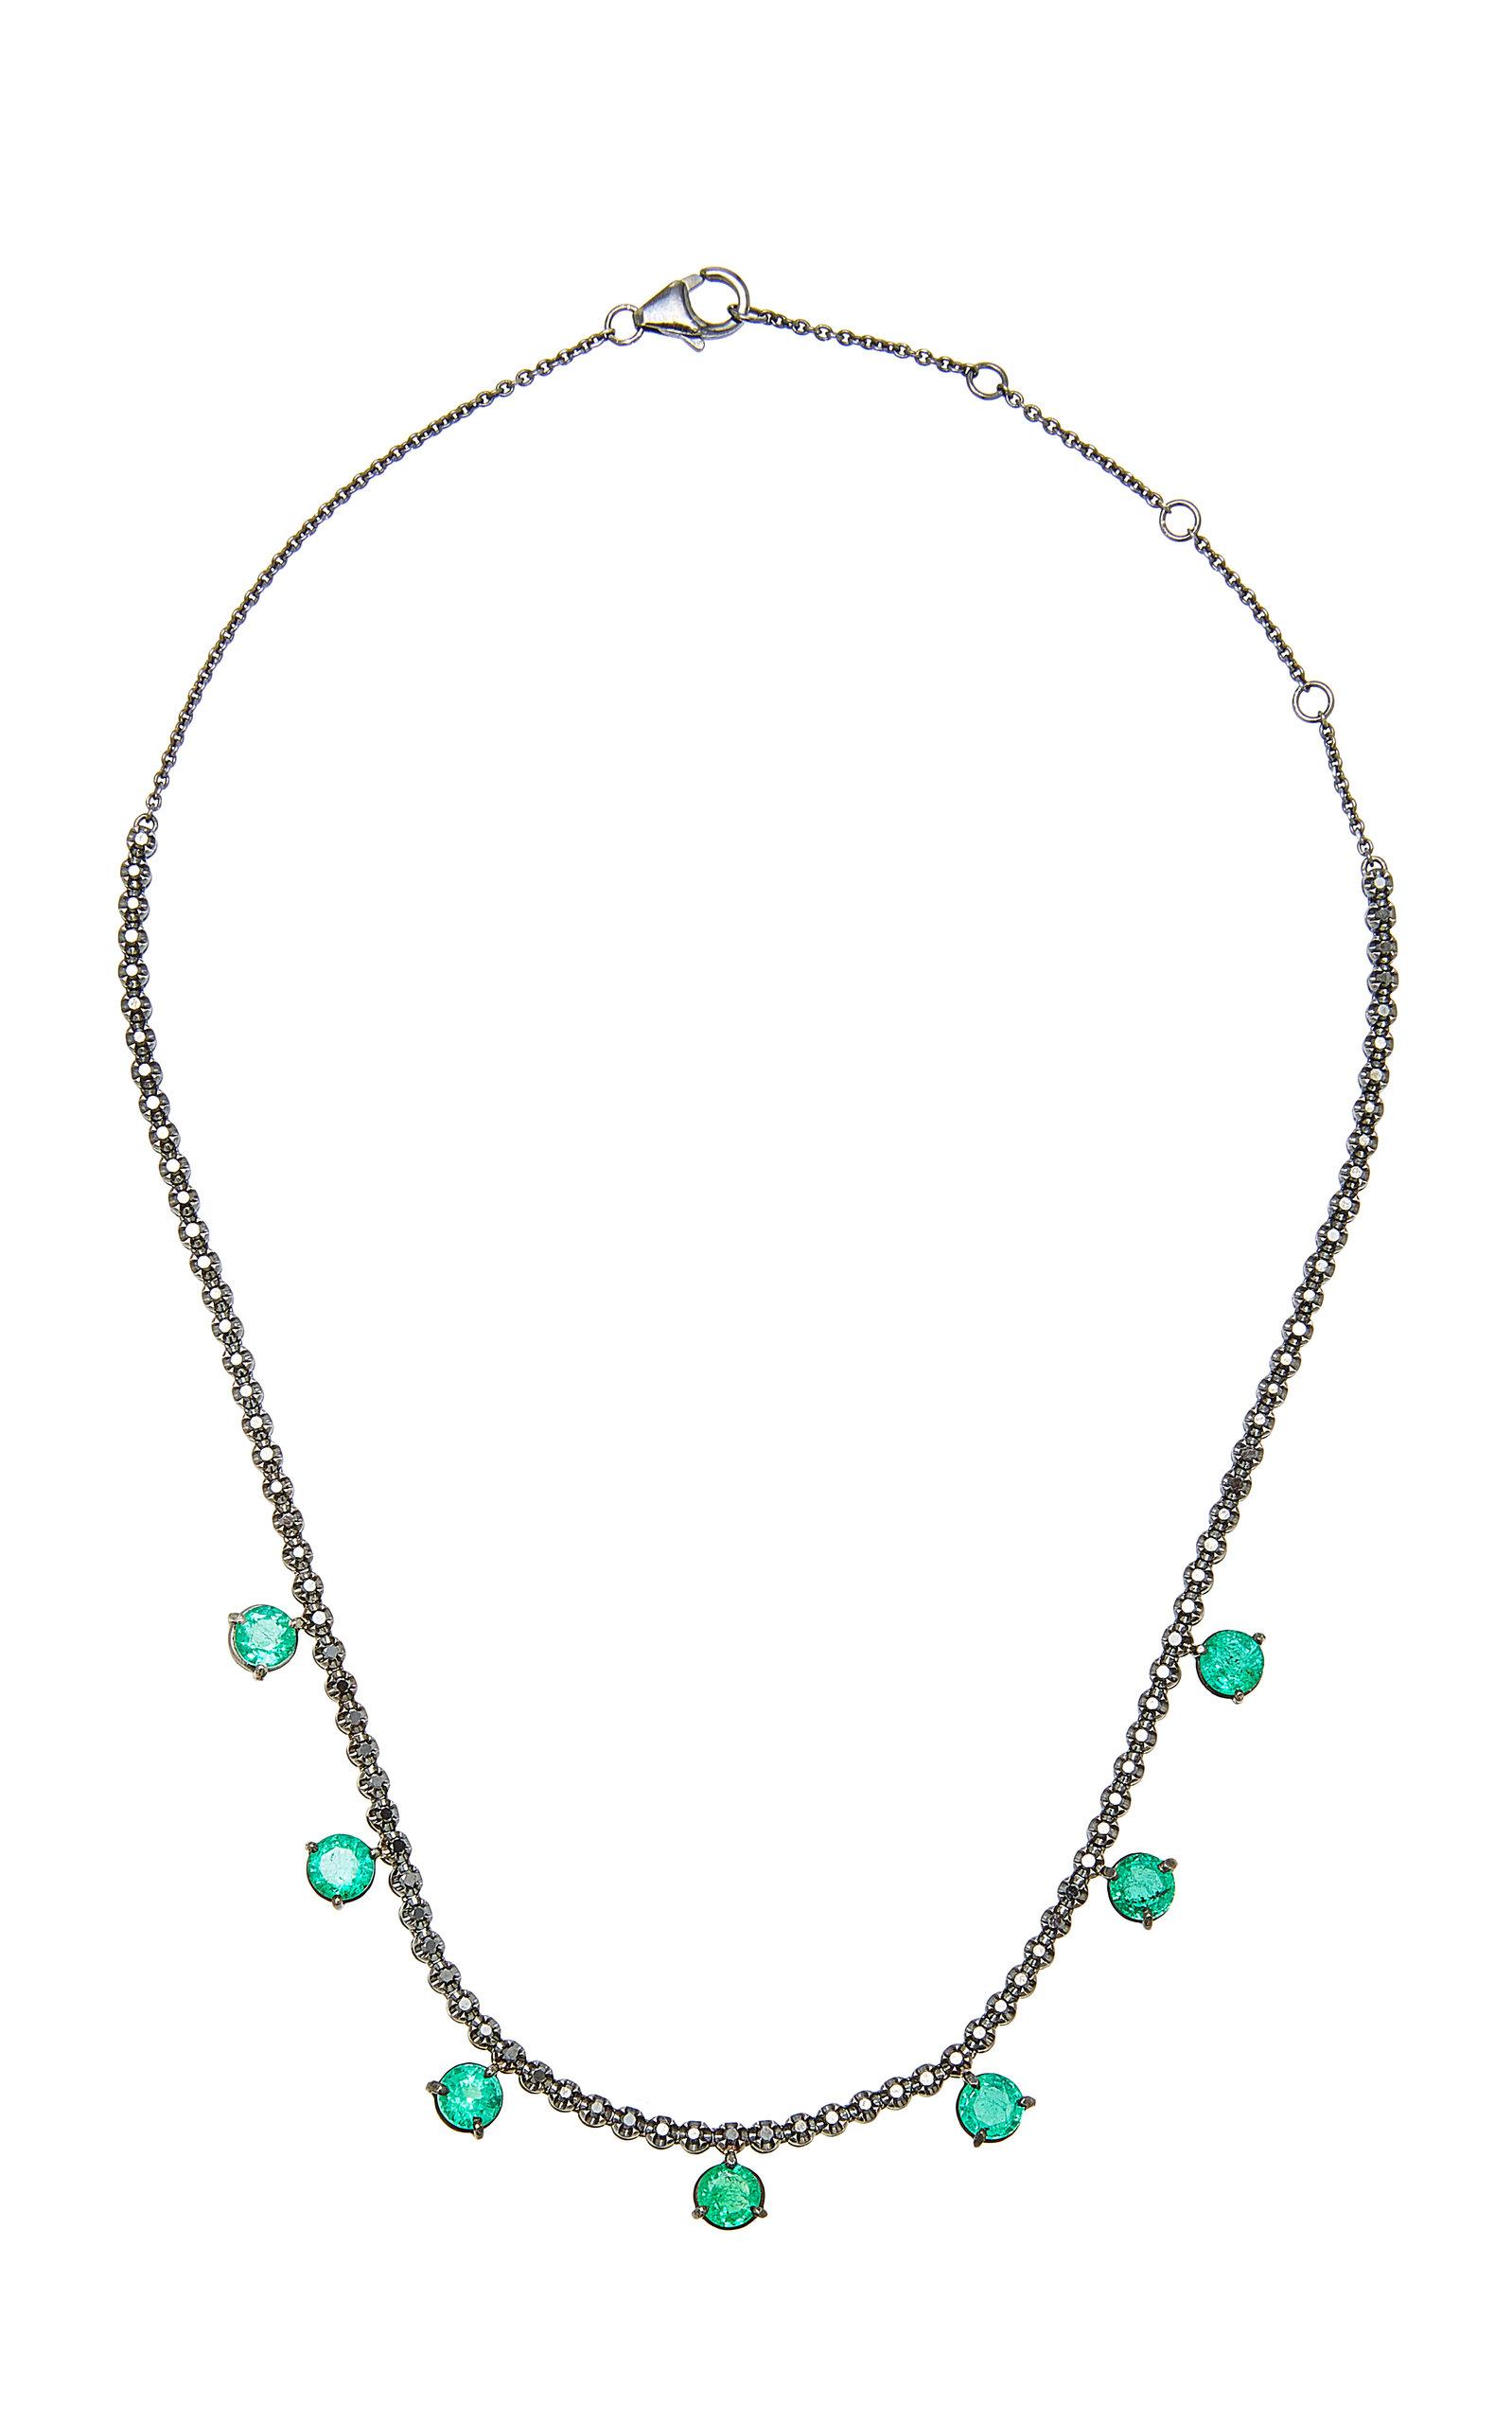 COLETTE JEWELRY | Colette Jewelry Black Diamond And 7 Emerald Necklace | Goxip